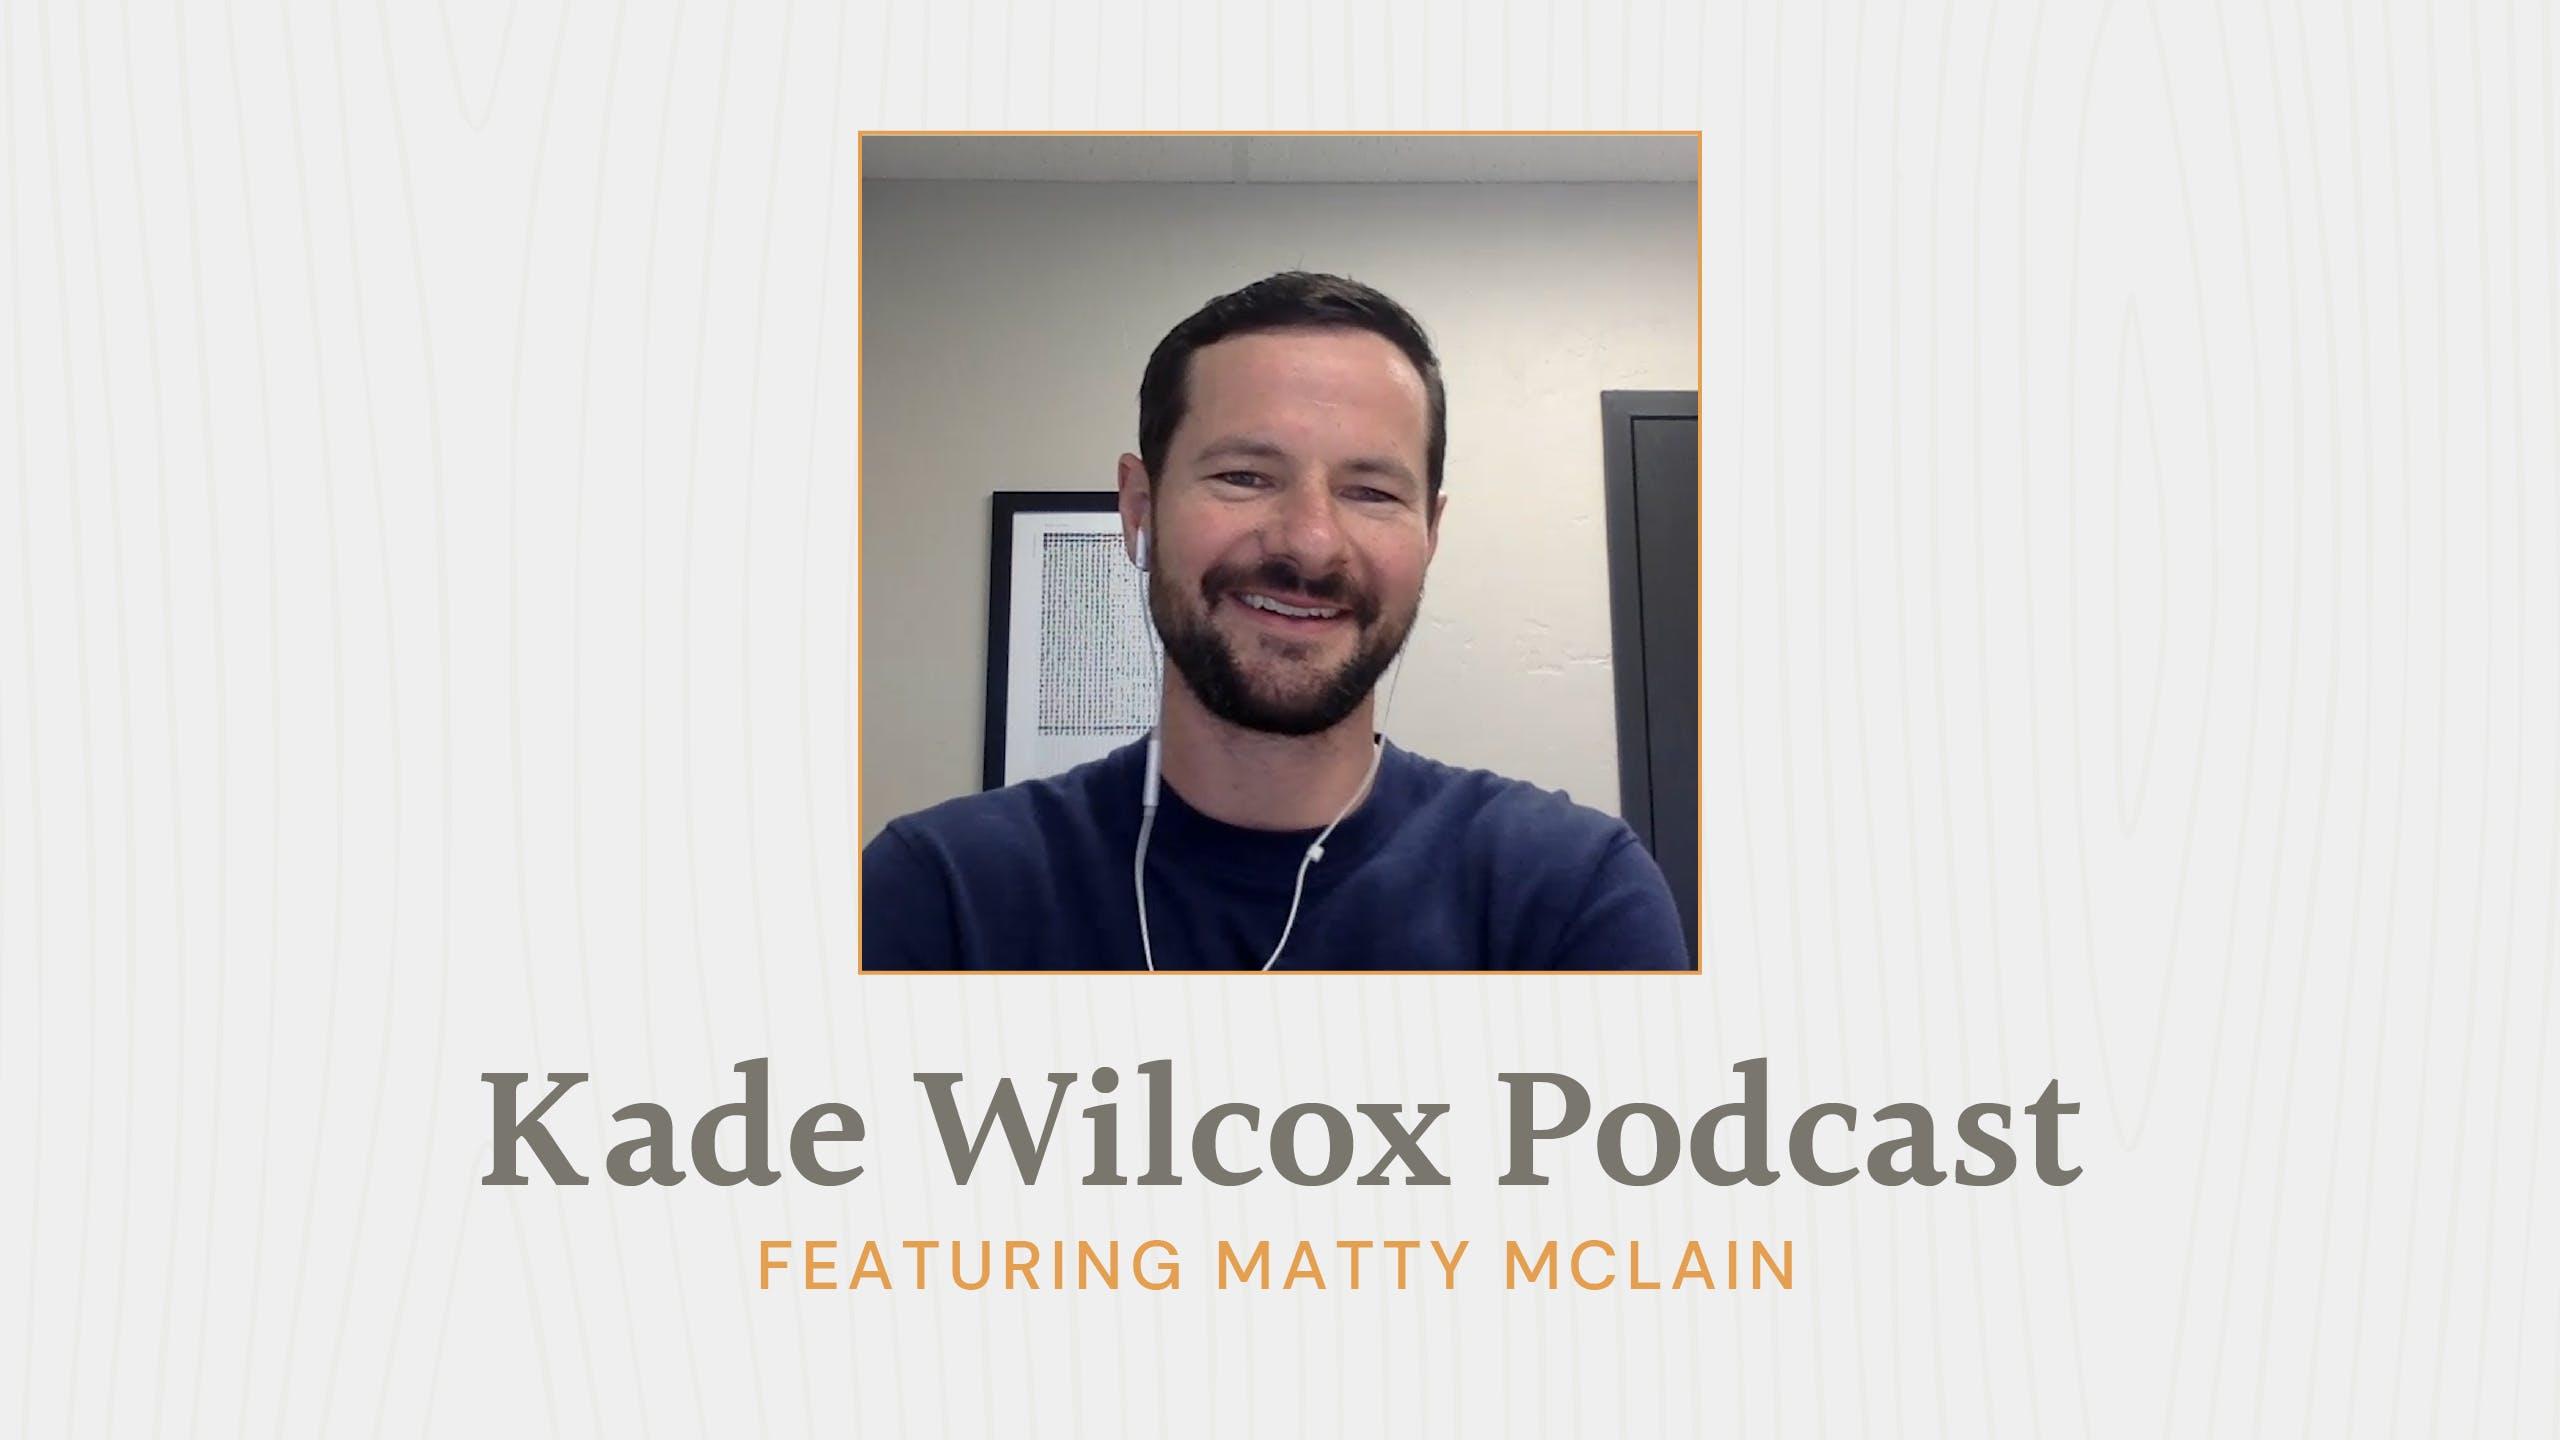 The Kade Wilcox Podcast: Matty McLain image